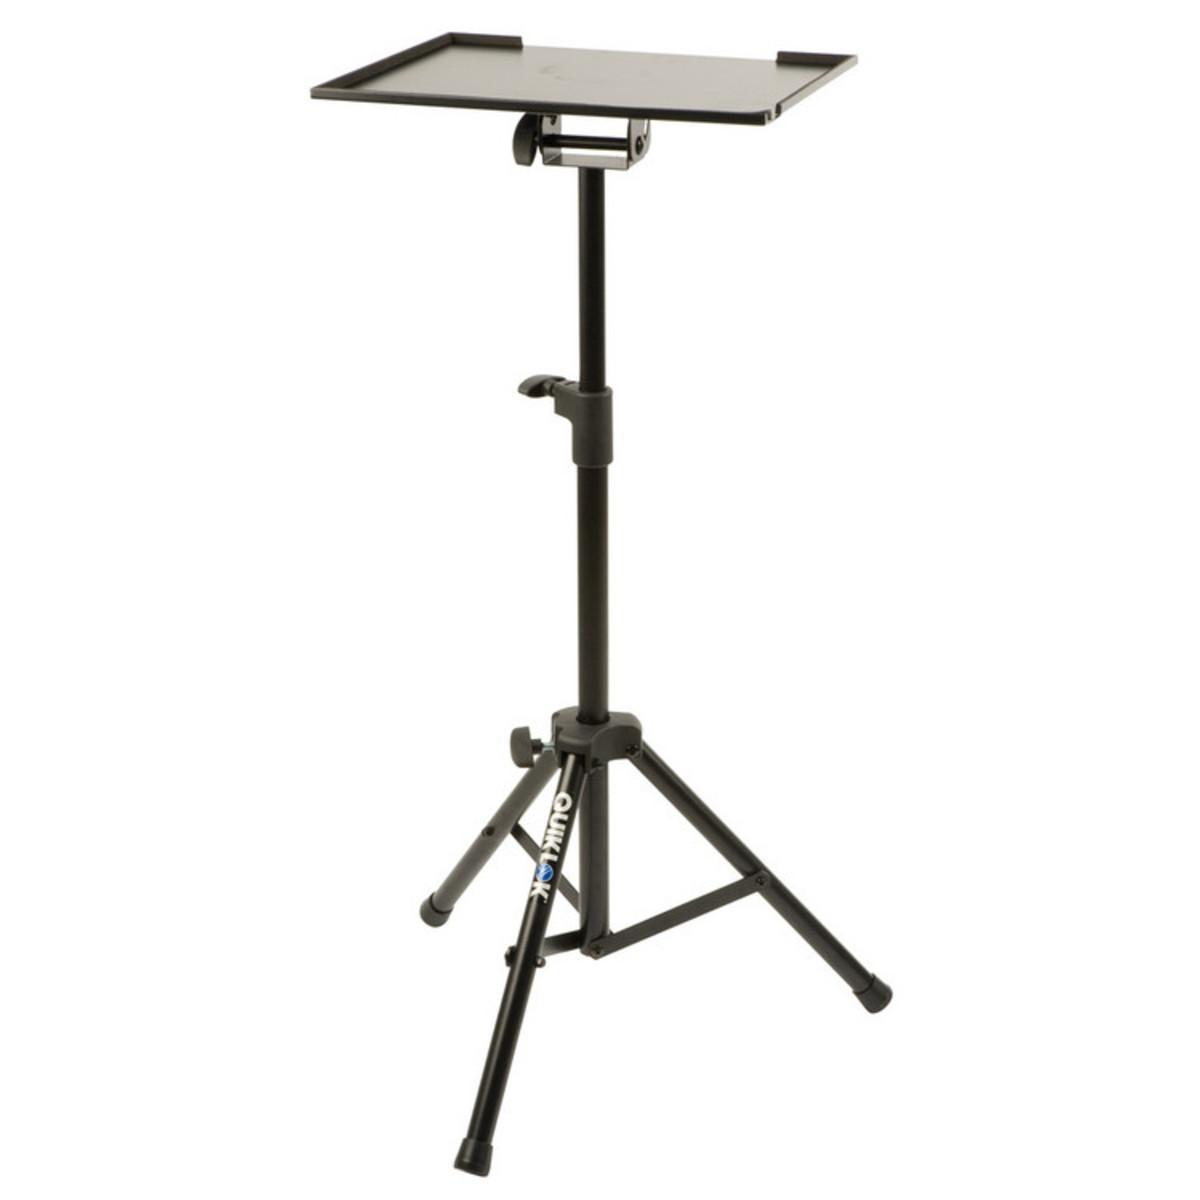 Quiklok Lph001 Large Laptop Accessory Holder Tripod Stand